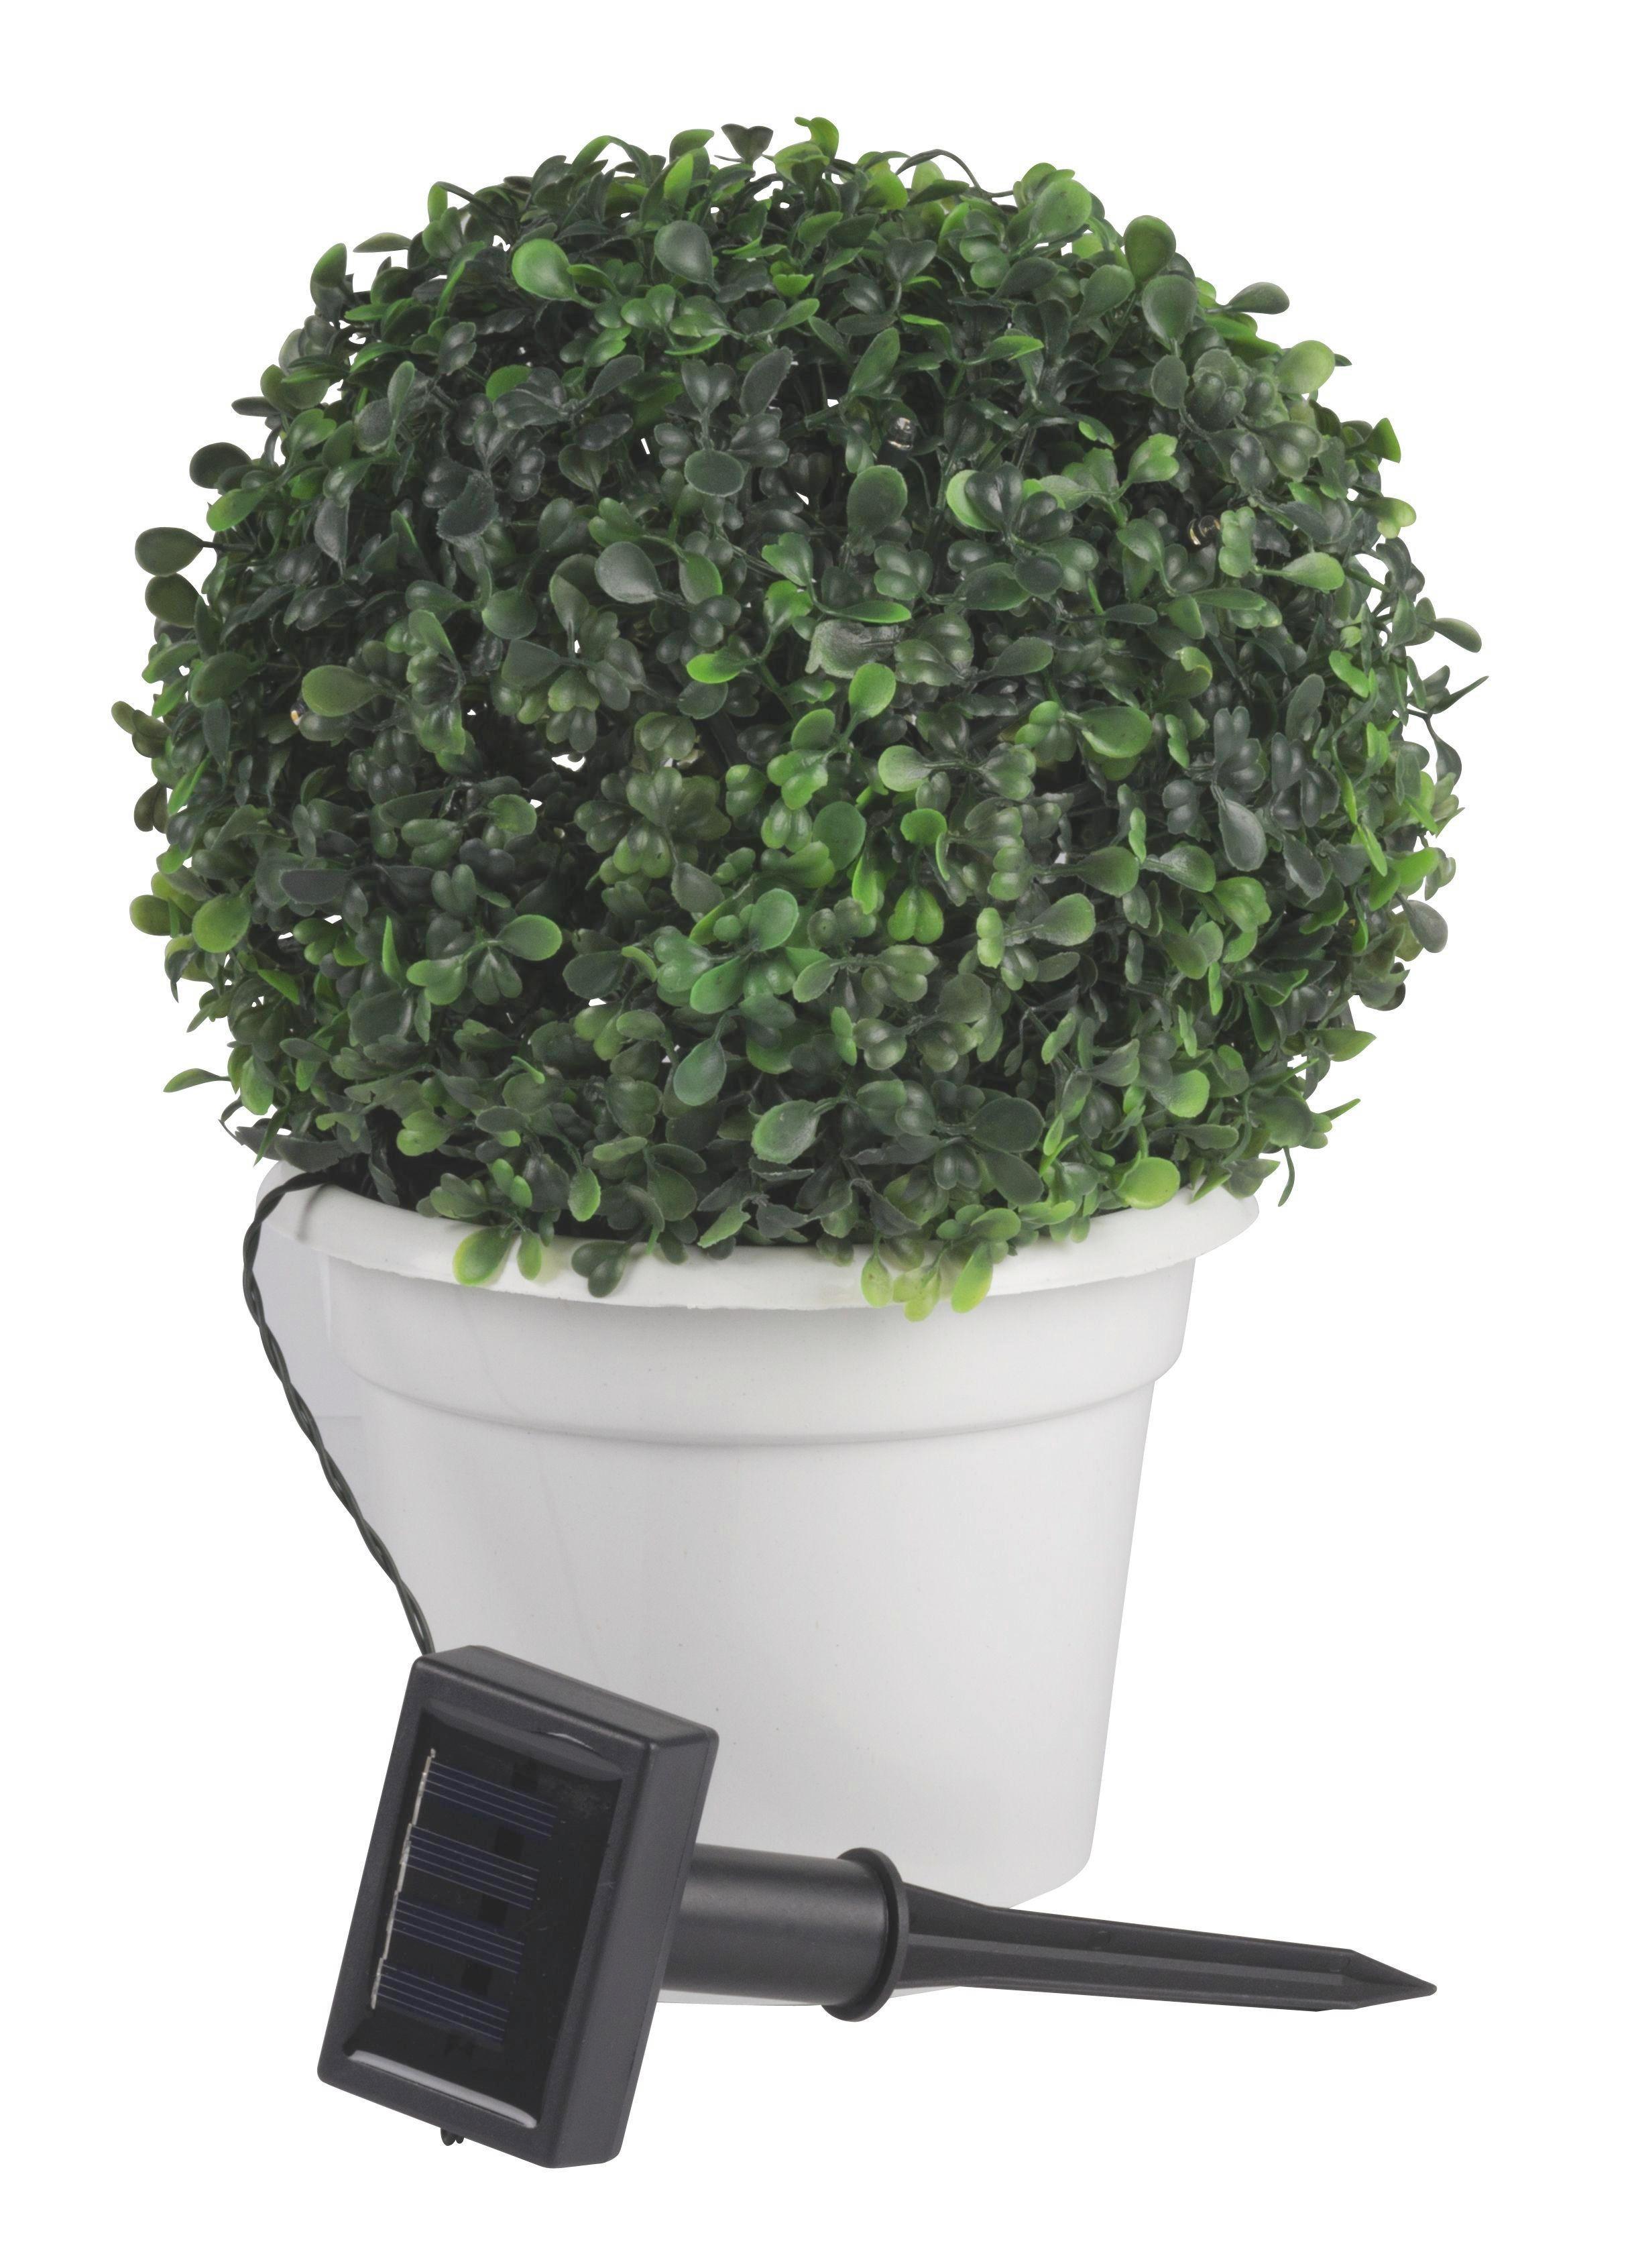 SOLAR DEKOLEUCHTE - Grün, Kunststoff (24/31cm)